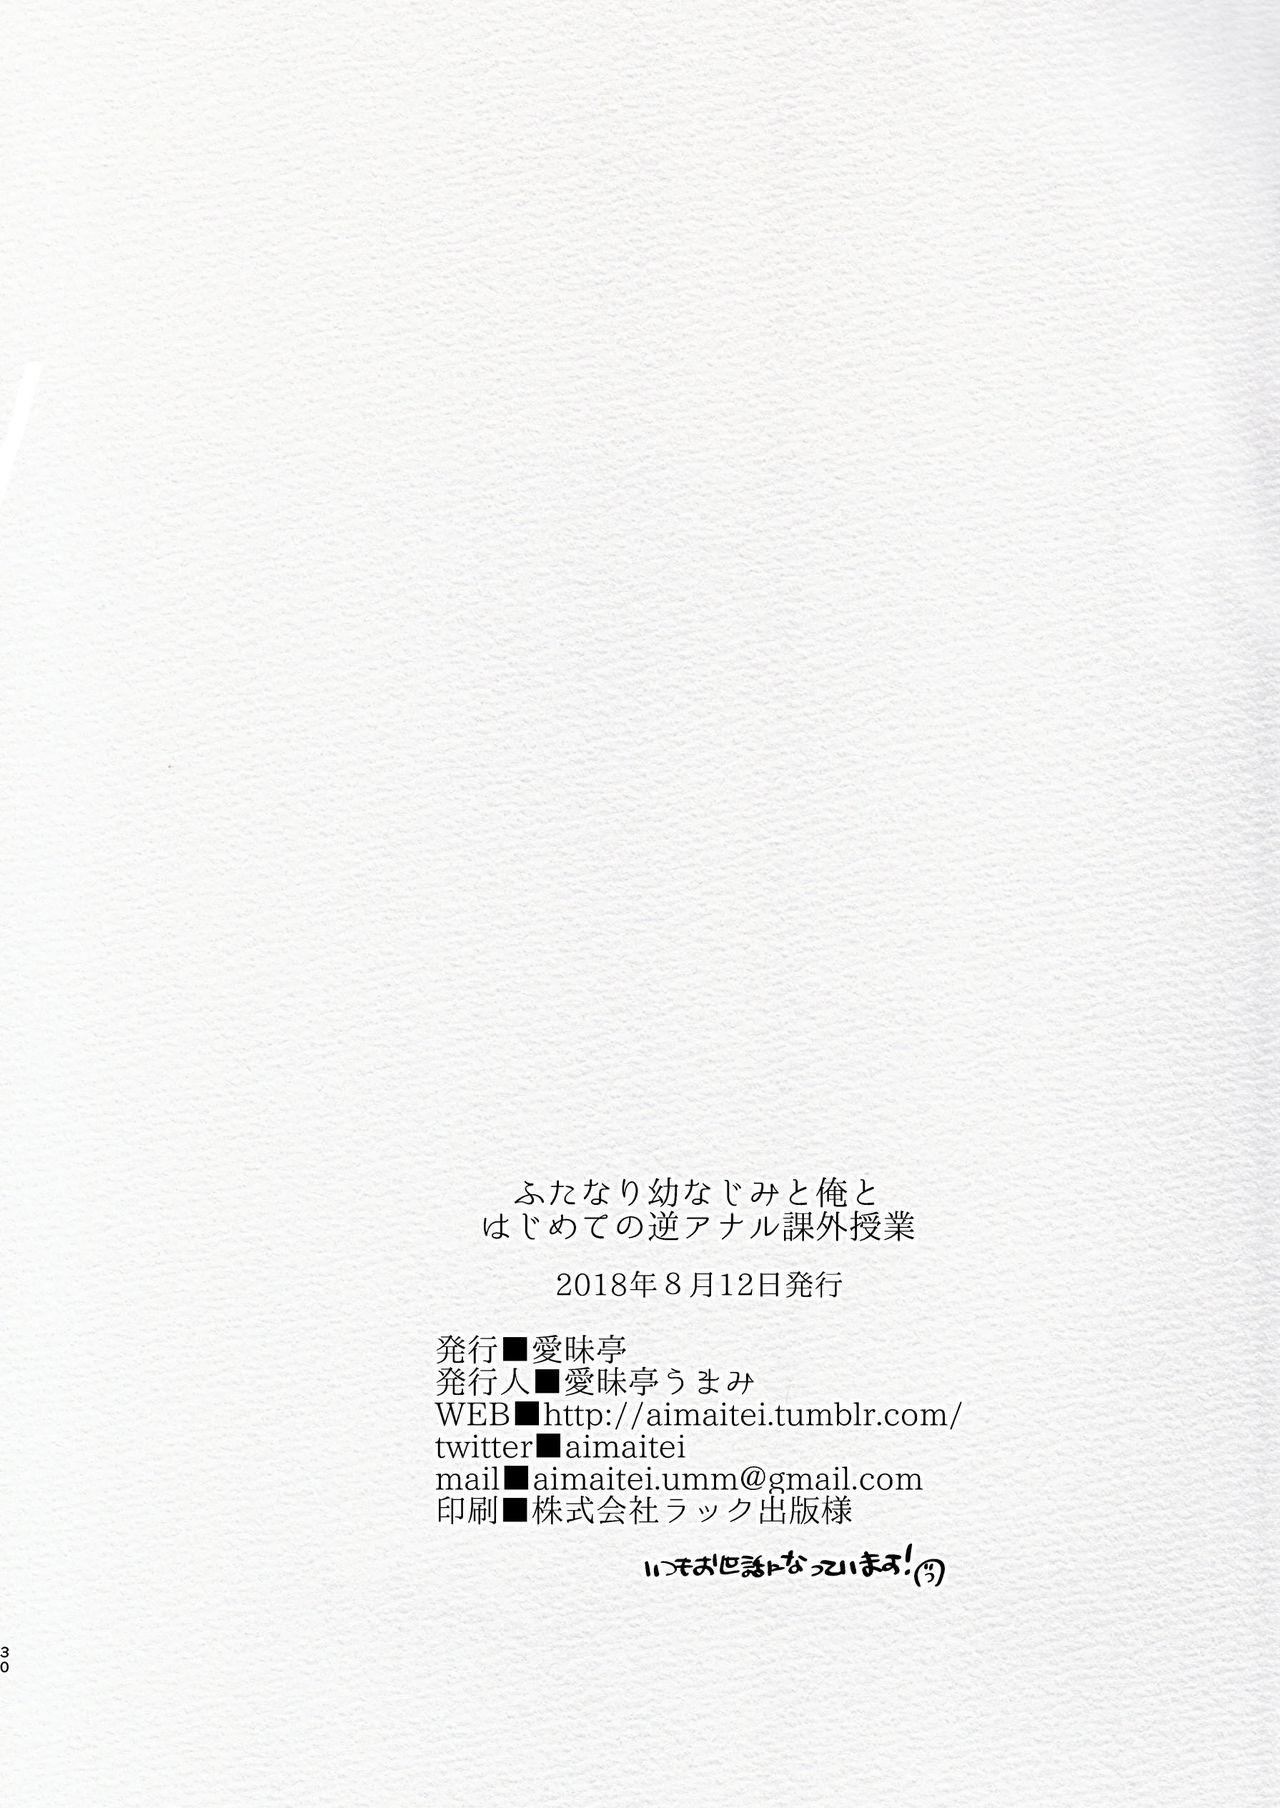 Futanari Osananajimi to Ore to Hajimete no Gyaku Anal Kagai Jugyou | Me and My Futanari Childhood Friend's First Extracurricular Lesson in Reverse Anal 29